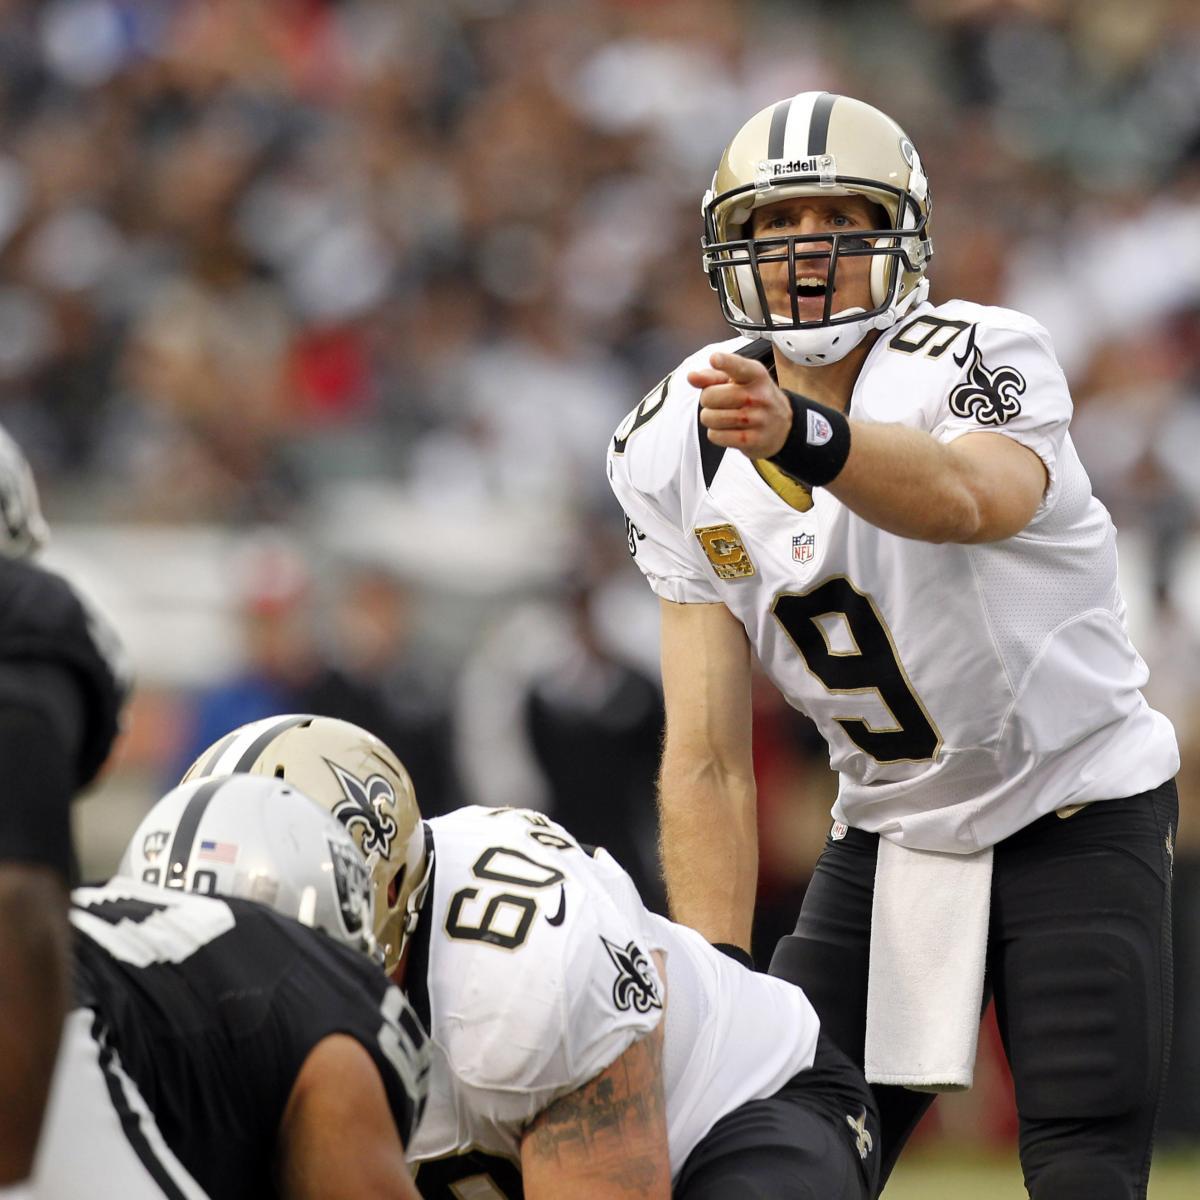 Raiders Vs. Saints: TV Info, Spread, Injury Updates, Game